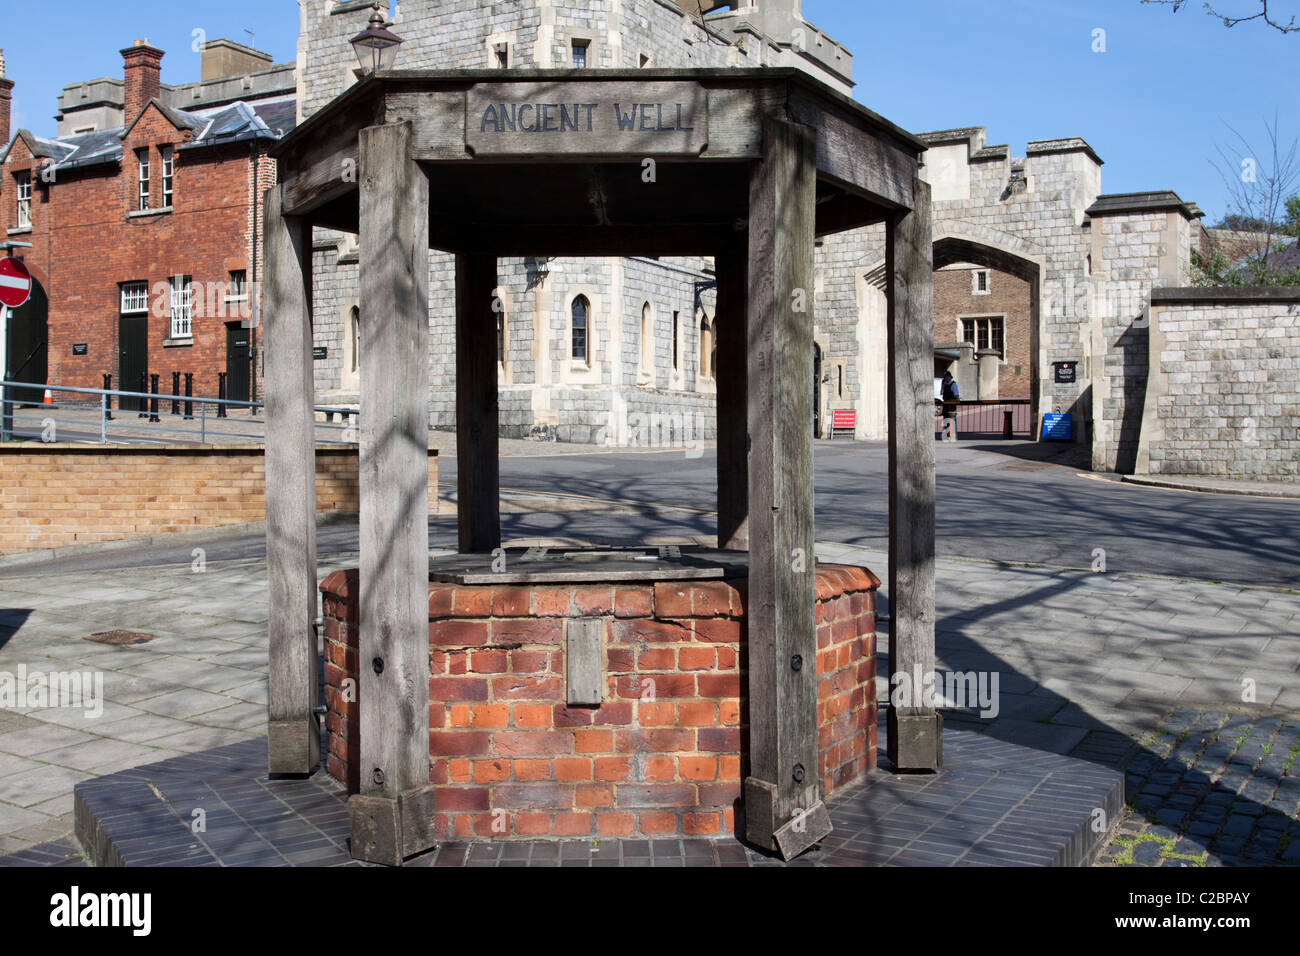 Ancient well, Windsor, Berkshire, England - Stock Image